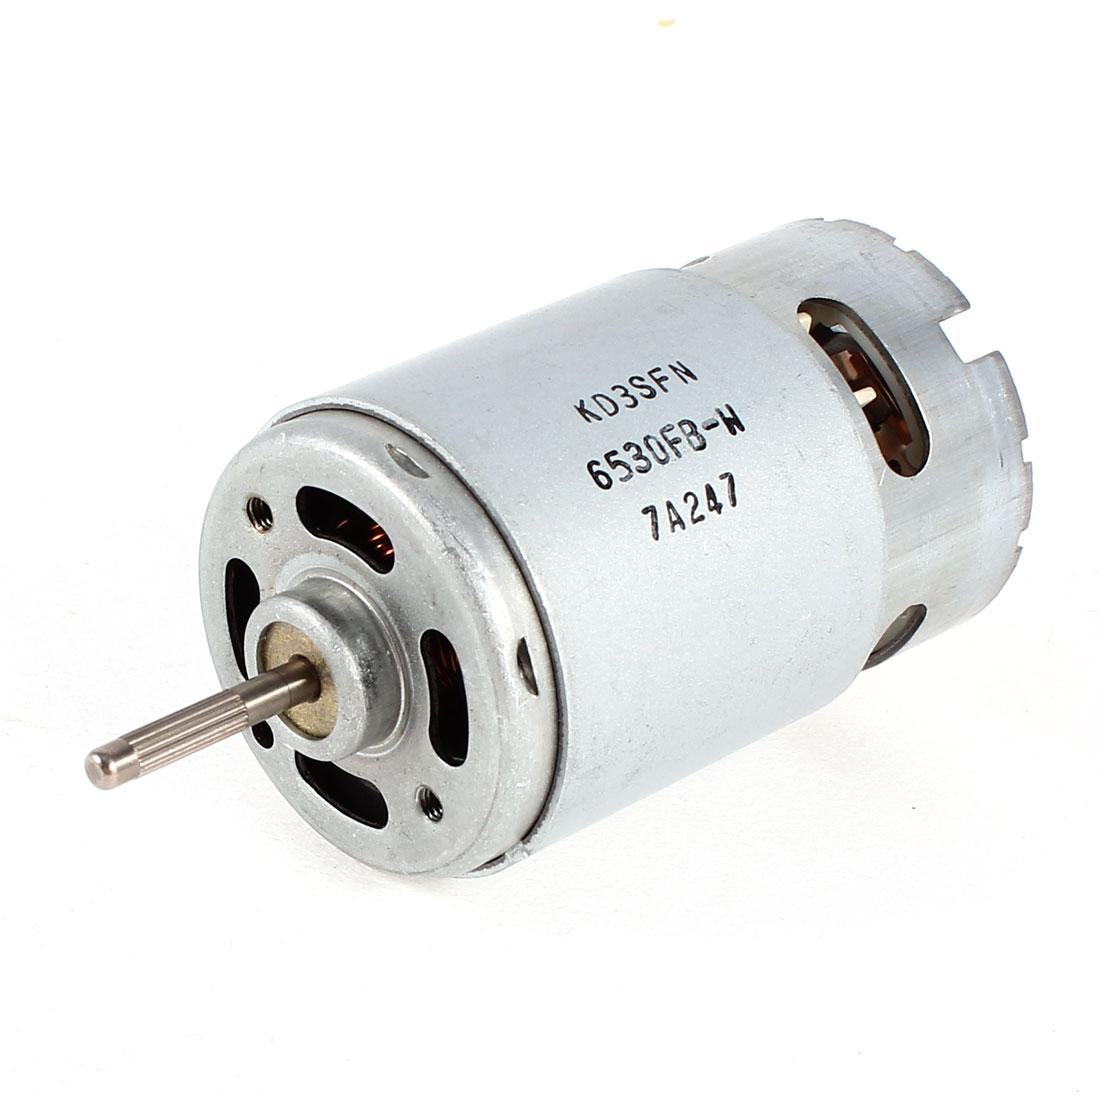 DC 3V-12V 3750RPM-15000RPM High Speed Cylinder Shaped Miniature Electric Motor